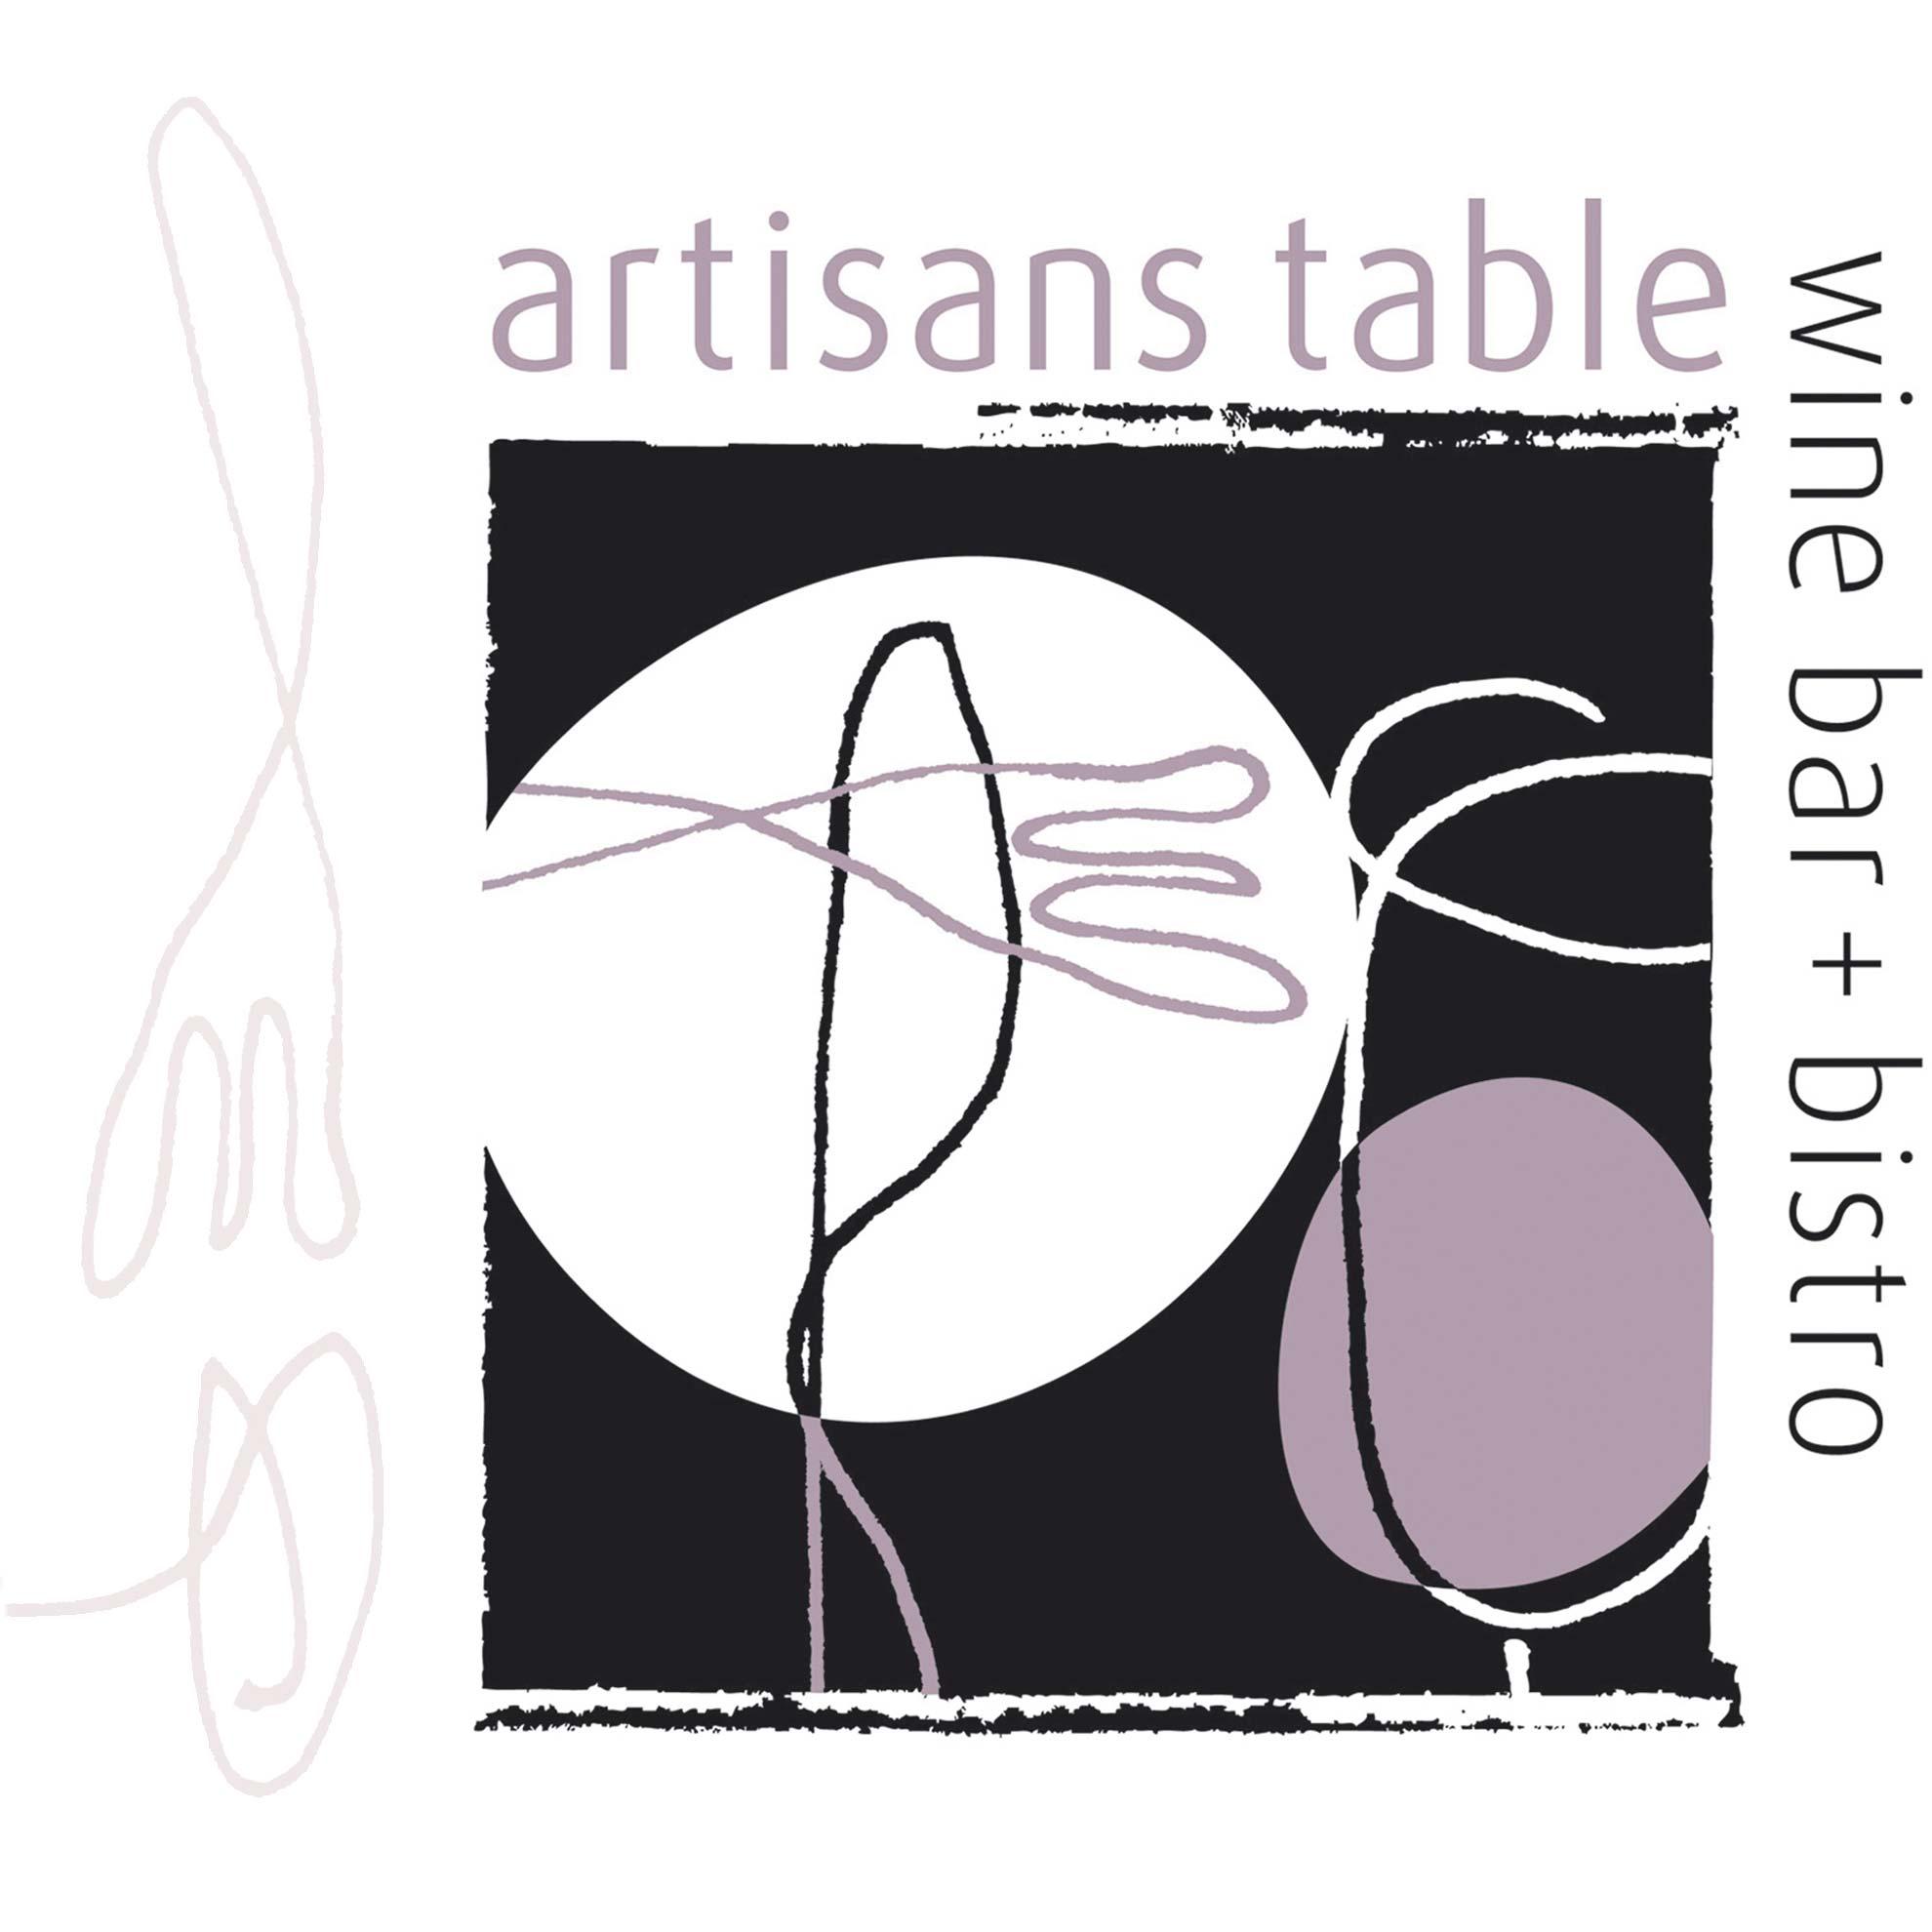 artisans table logo